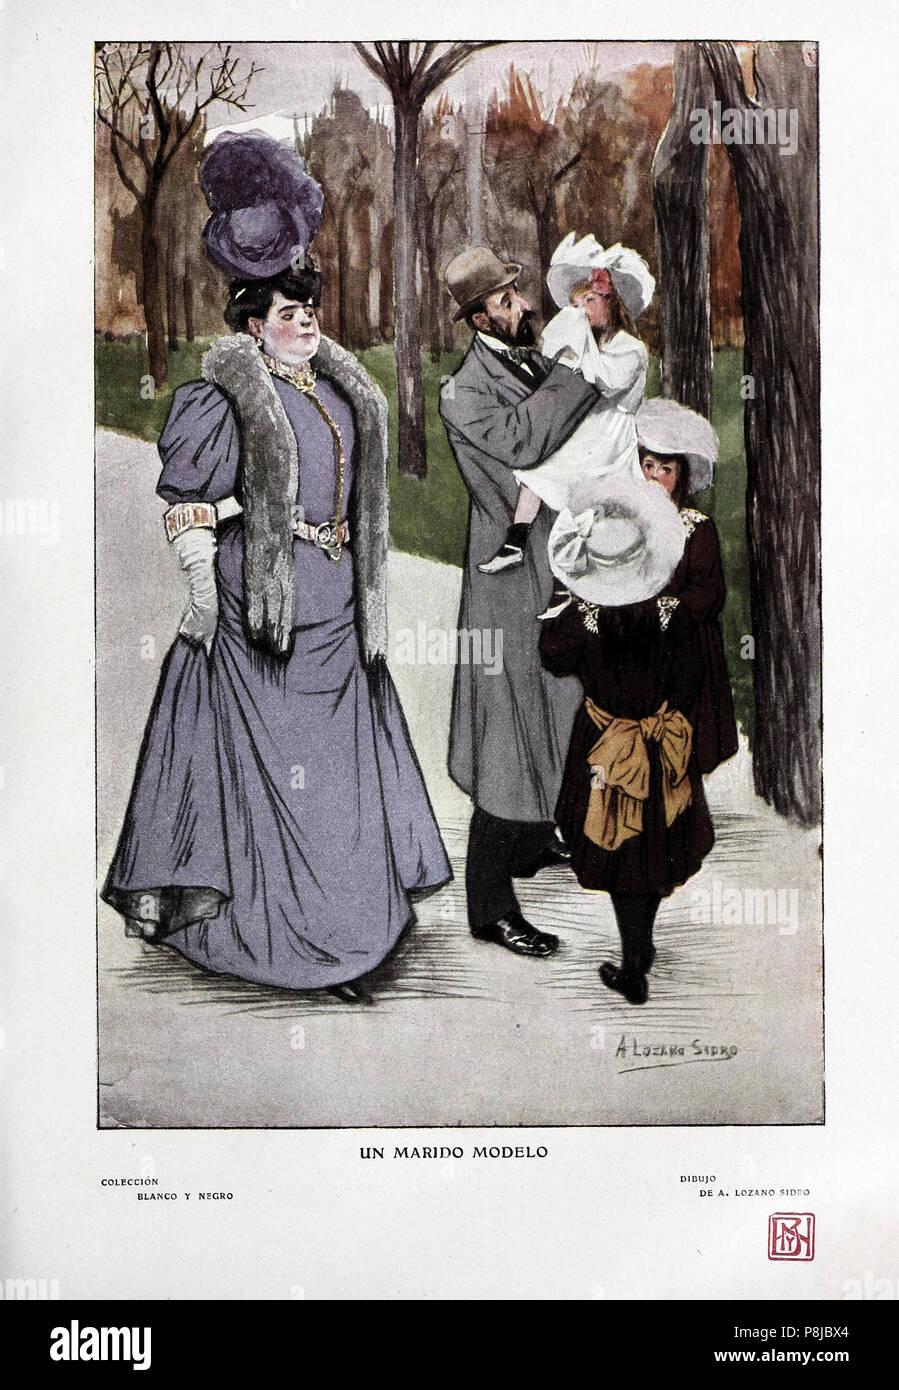 . 566 ONU modelo, marido de Lozano Sidro, Blanco y Negro, 08-06-1907 Imagen De Stock